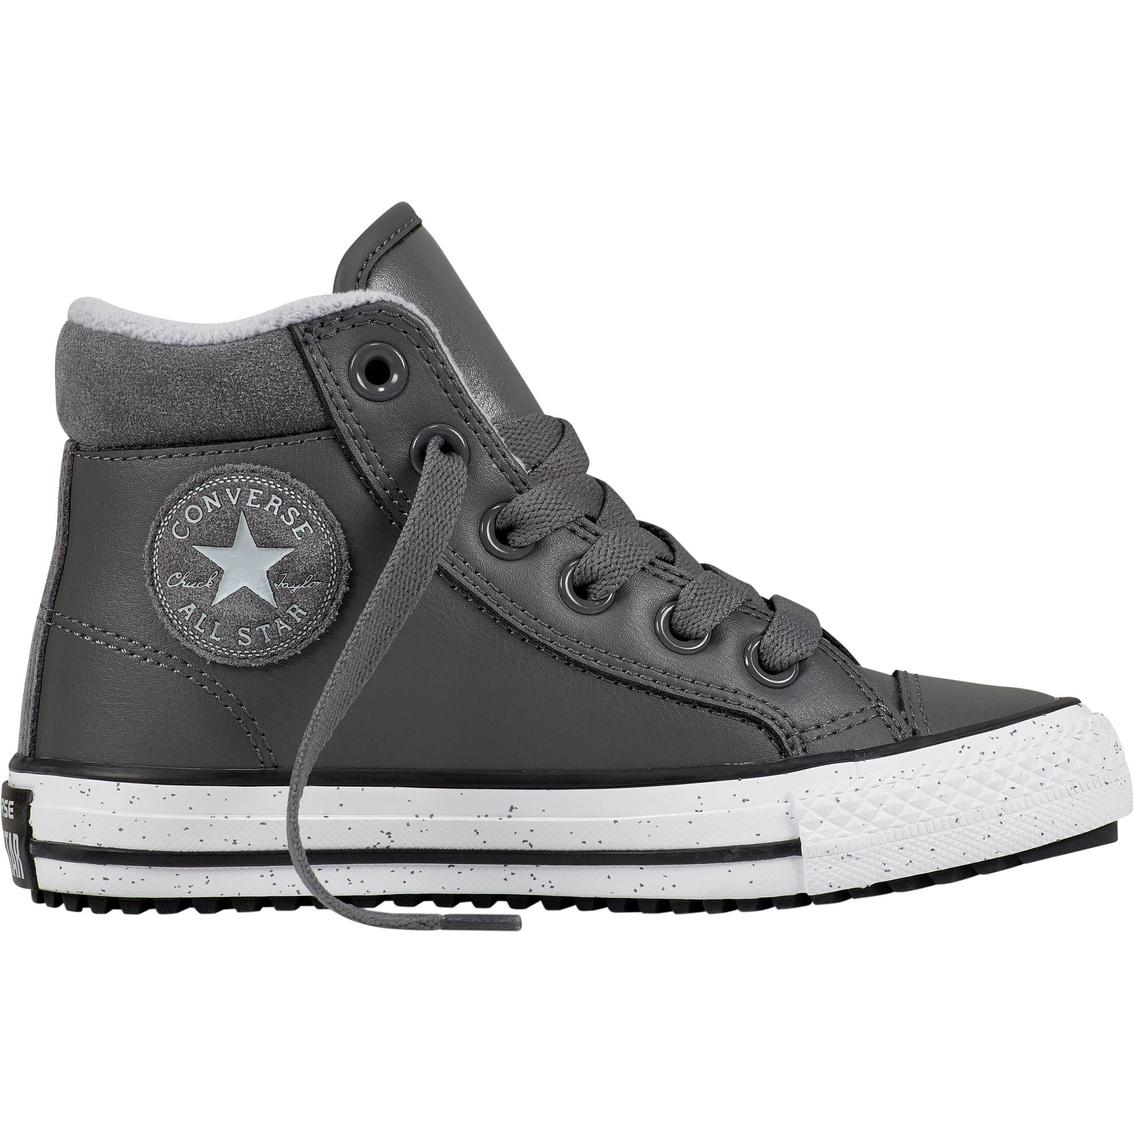 9171bee0eae7 Converse Chuck Taylor All Star Boys Boot Pc Hi